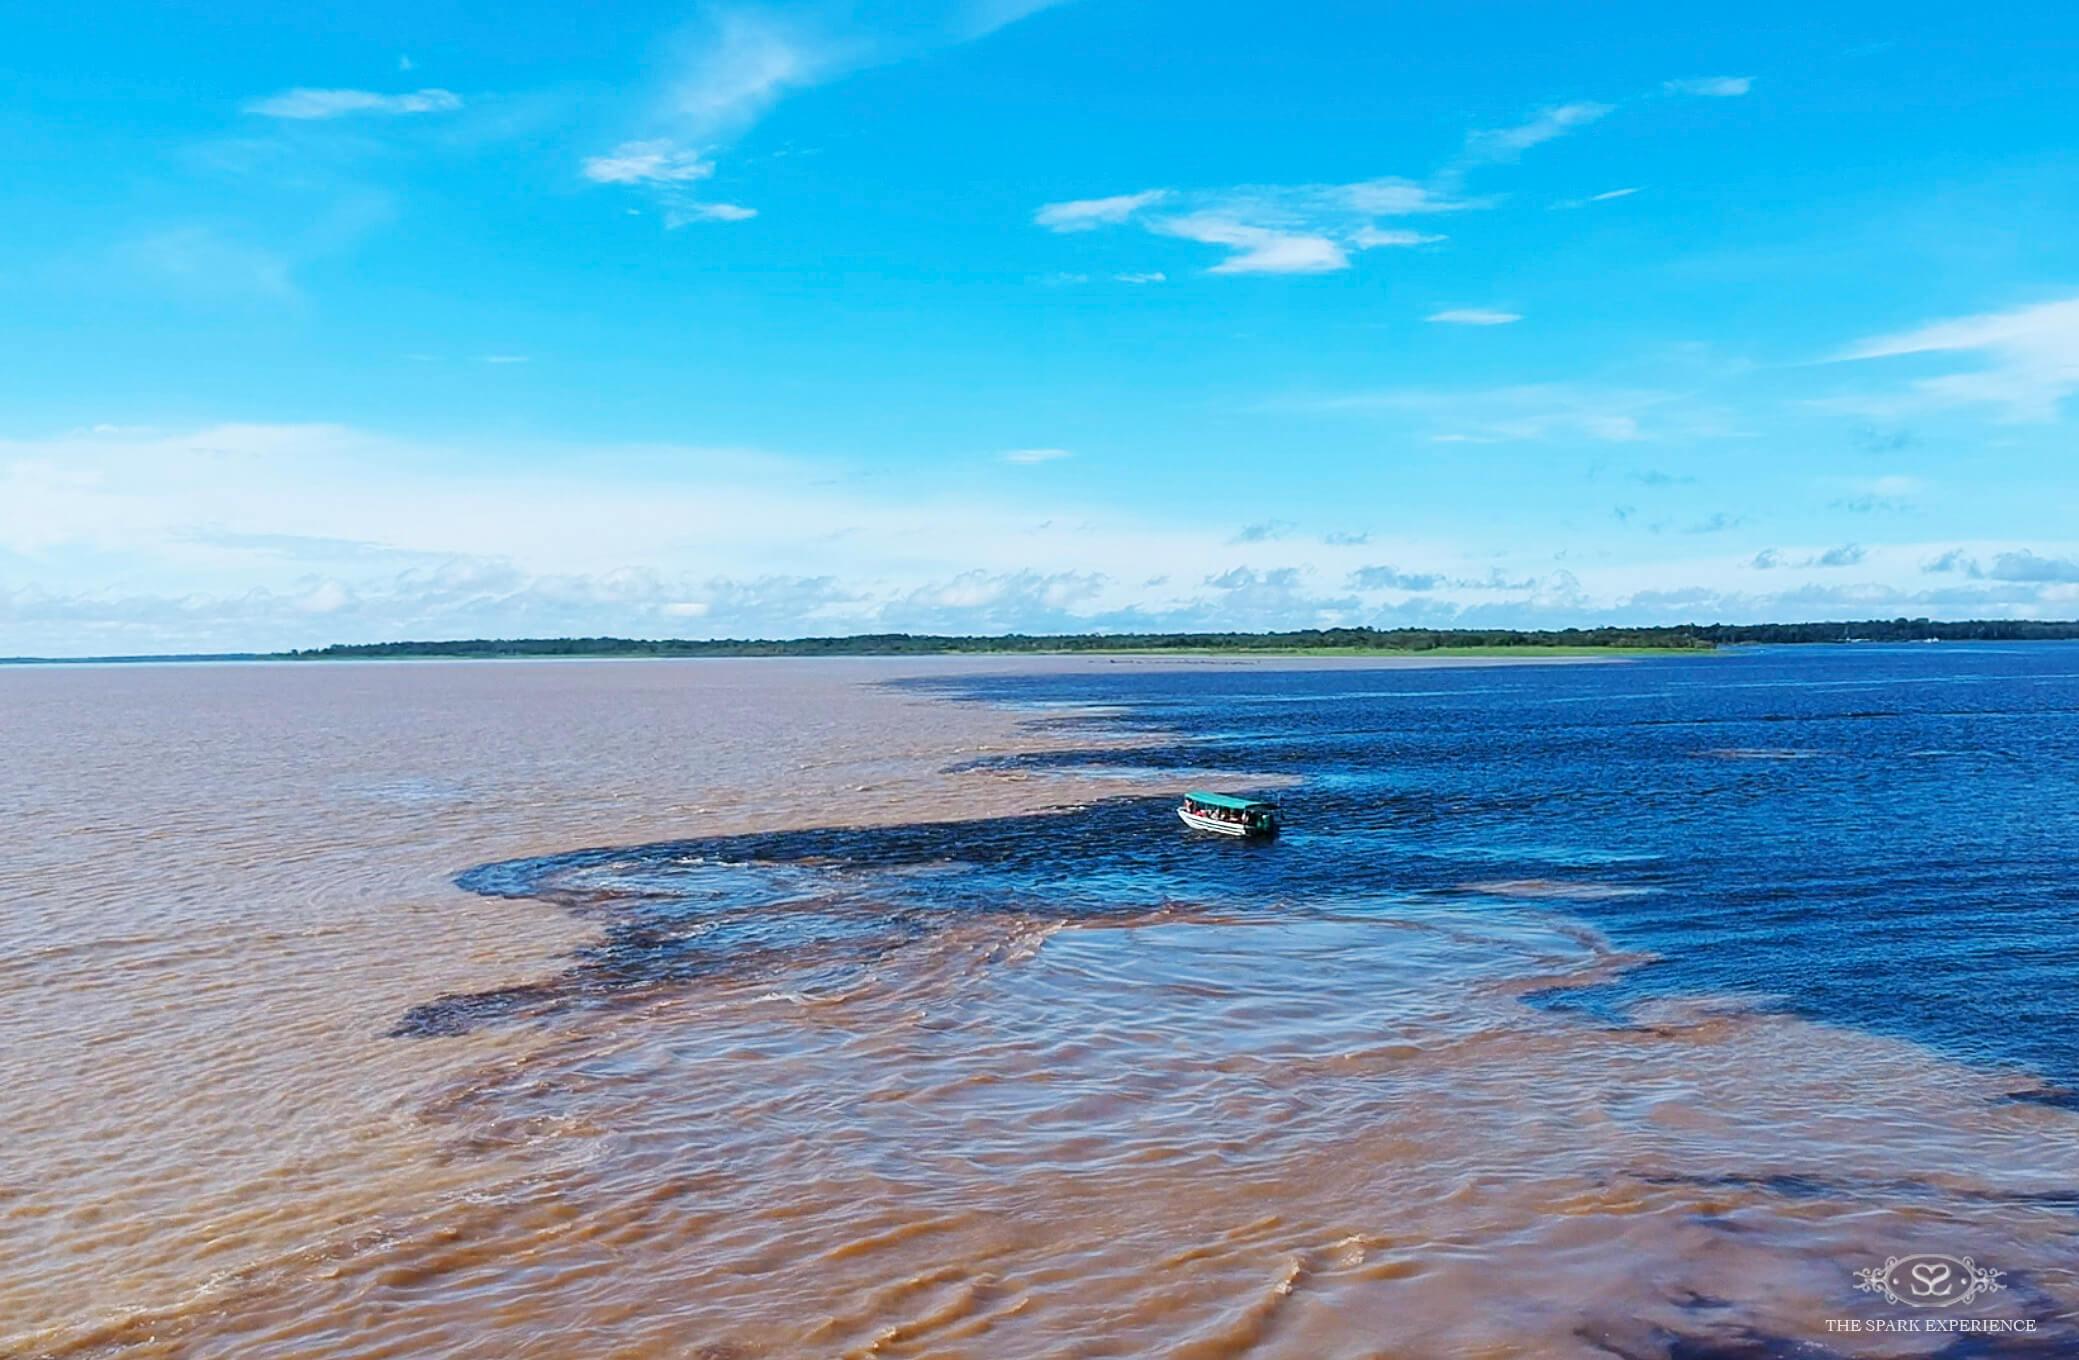 rio negro solimoes amazon river